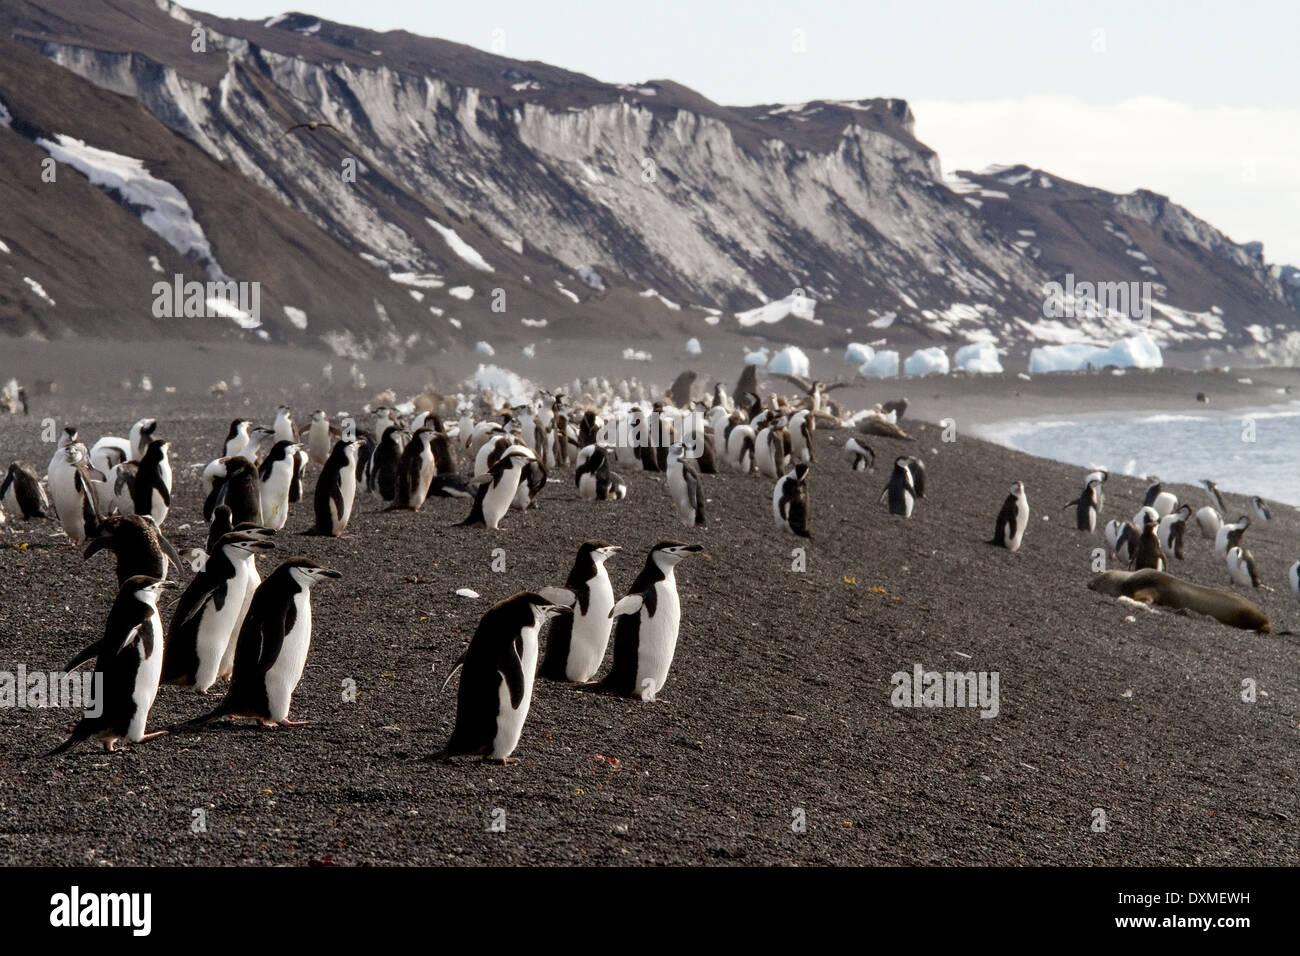 Antarctica penguins, Chinstrap penguin, Pygoscelis antarctica, Bailey Head beach, Deception Island, Antarctic landscape. - Stock Image